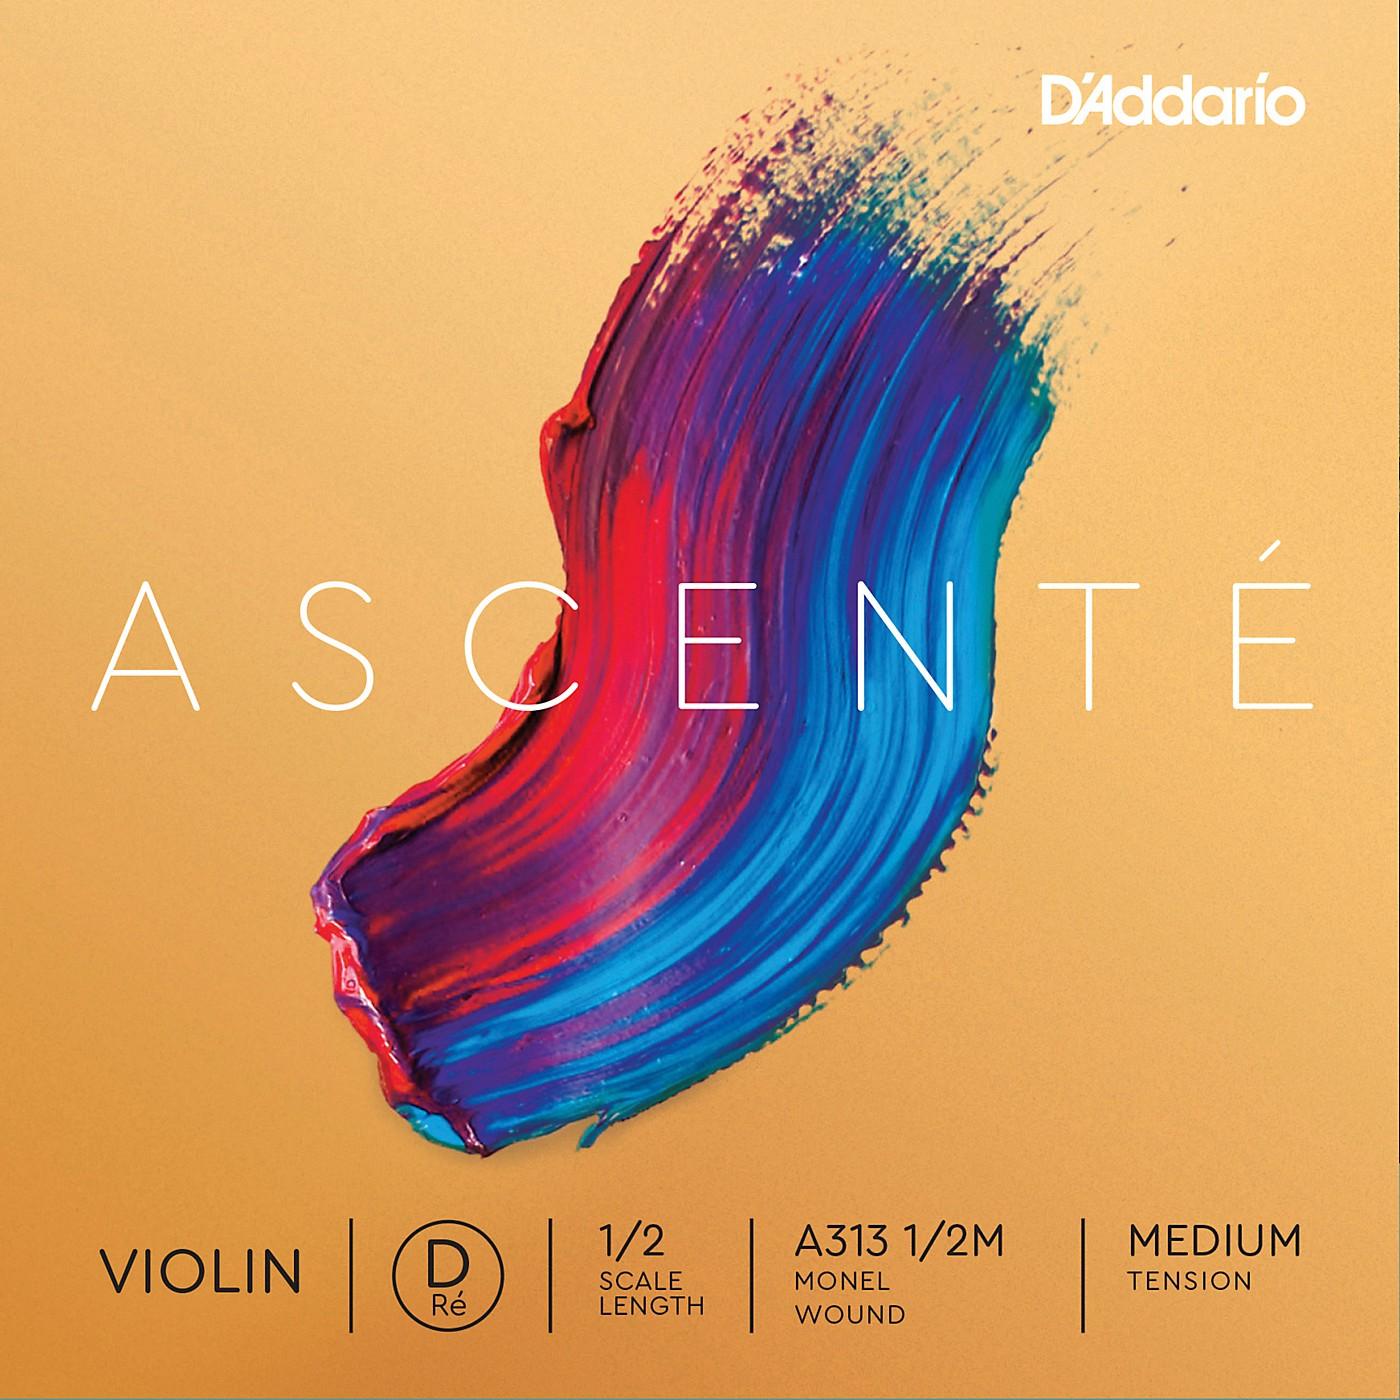 D'Addario Ascente Violin D String thumbnail